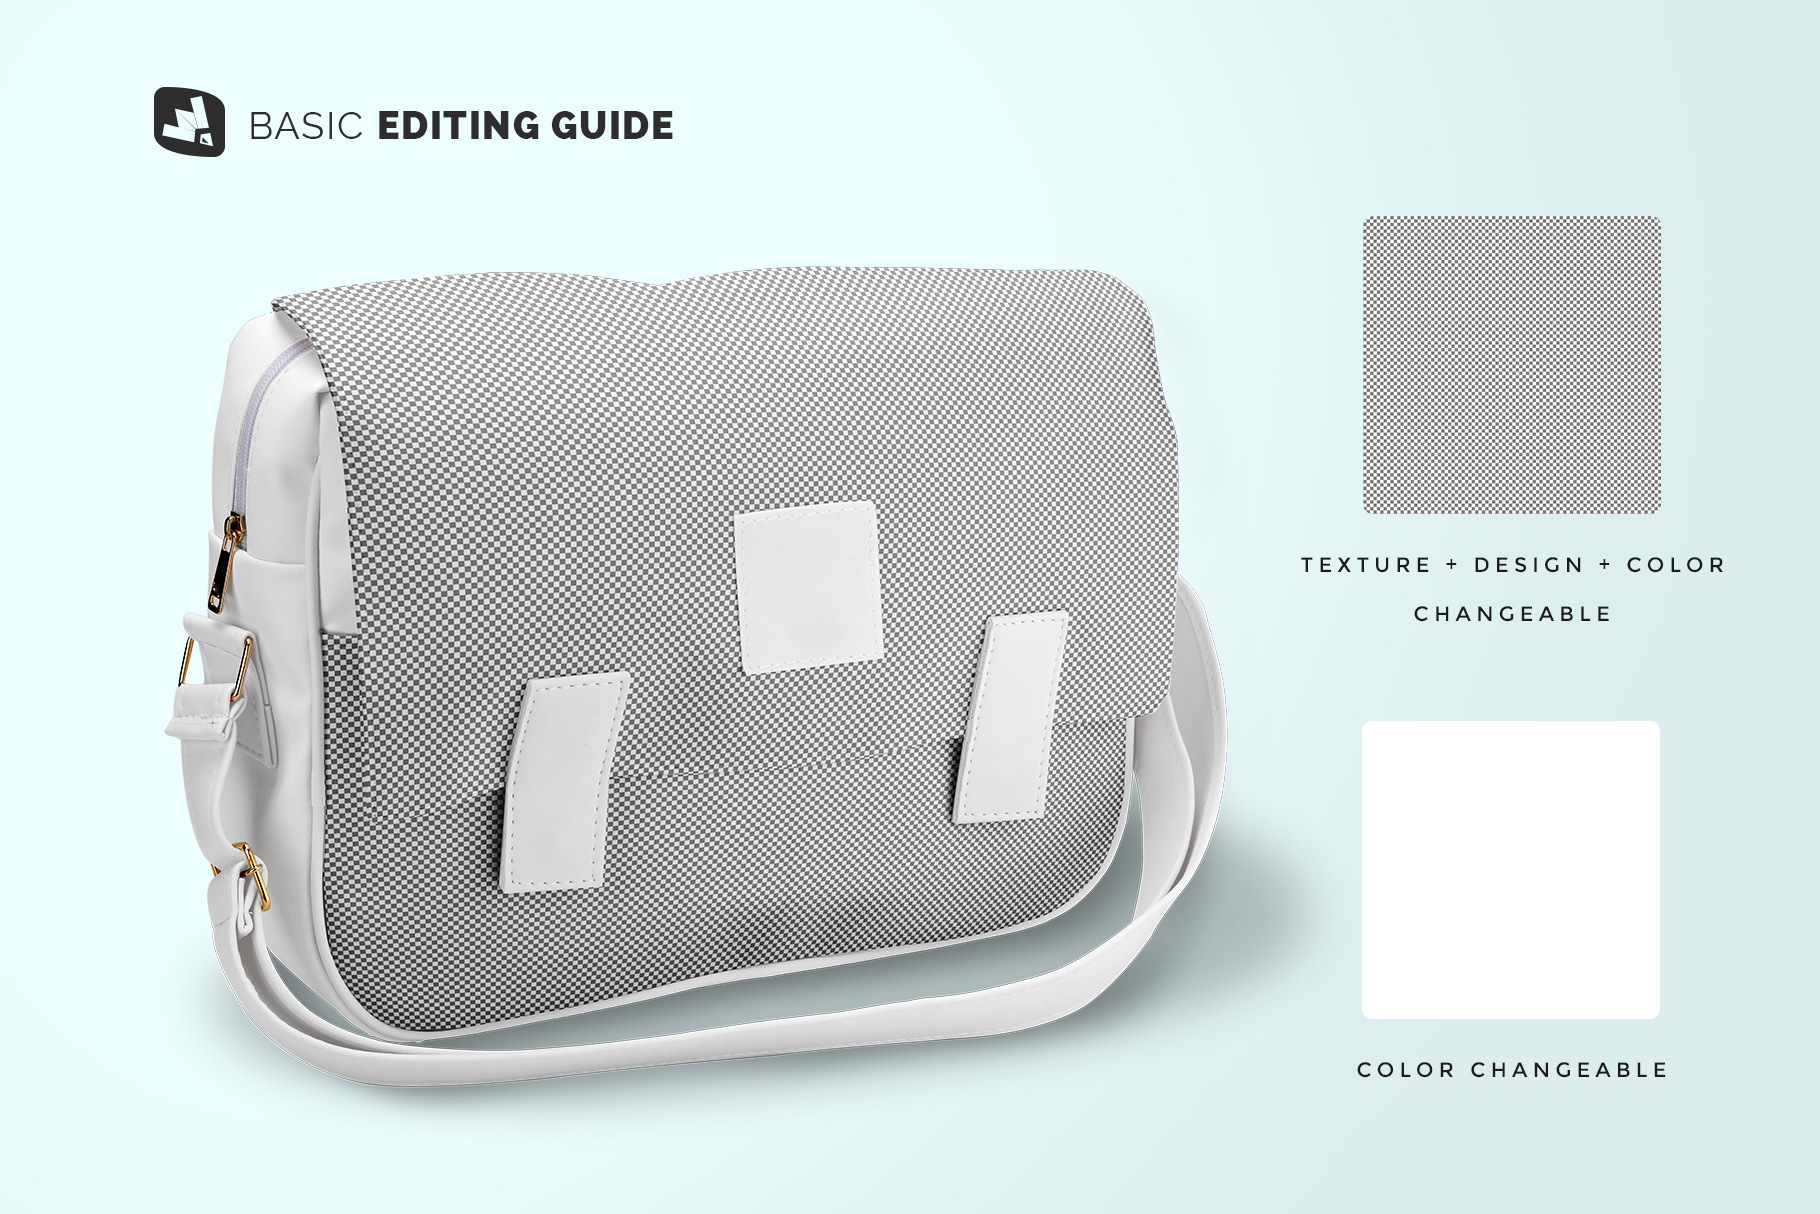 editability of the leather messenger bag mockup